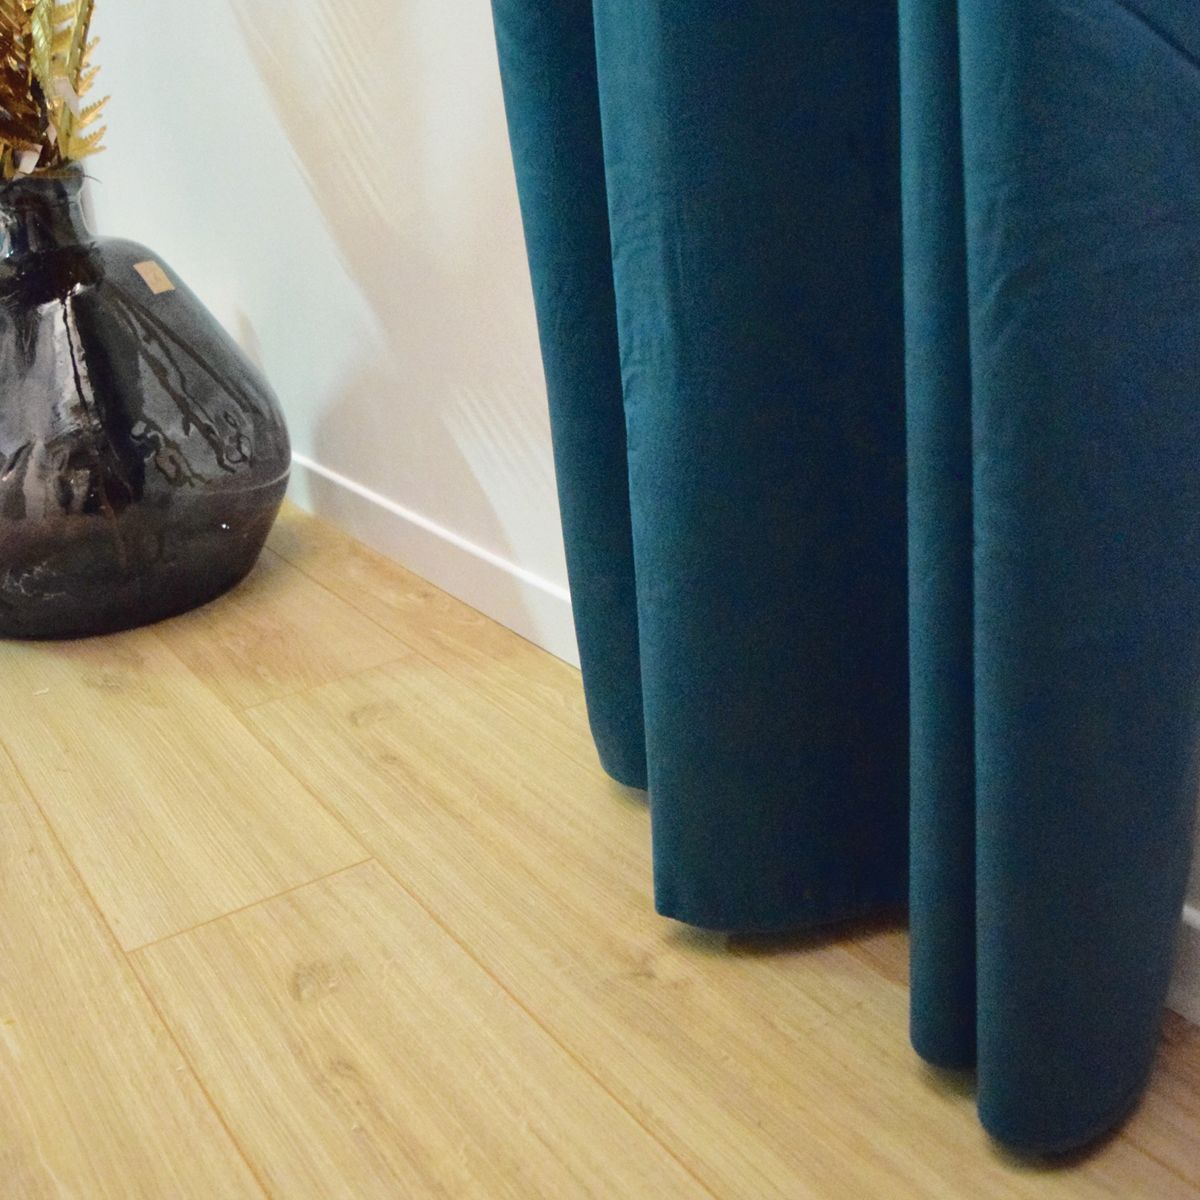 Rideau occultant en velours uni bleu canard 140x260 cm